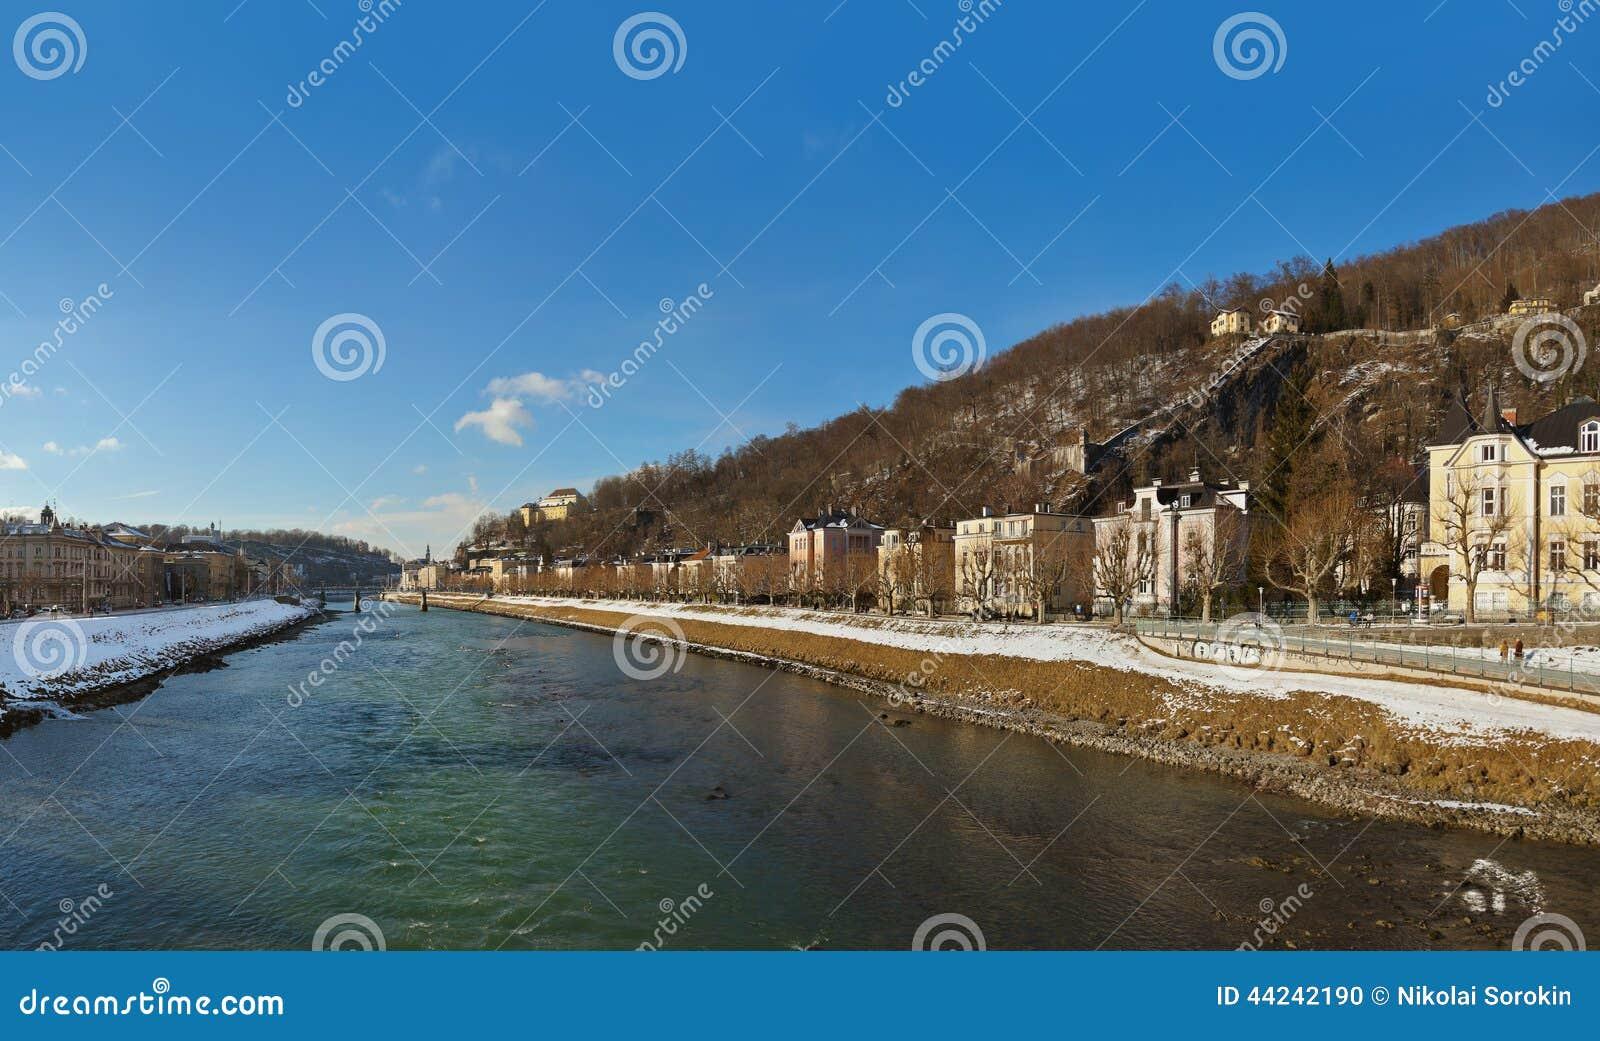 travel sea wallpaper panorama - photo #11